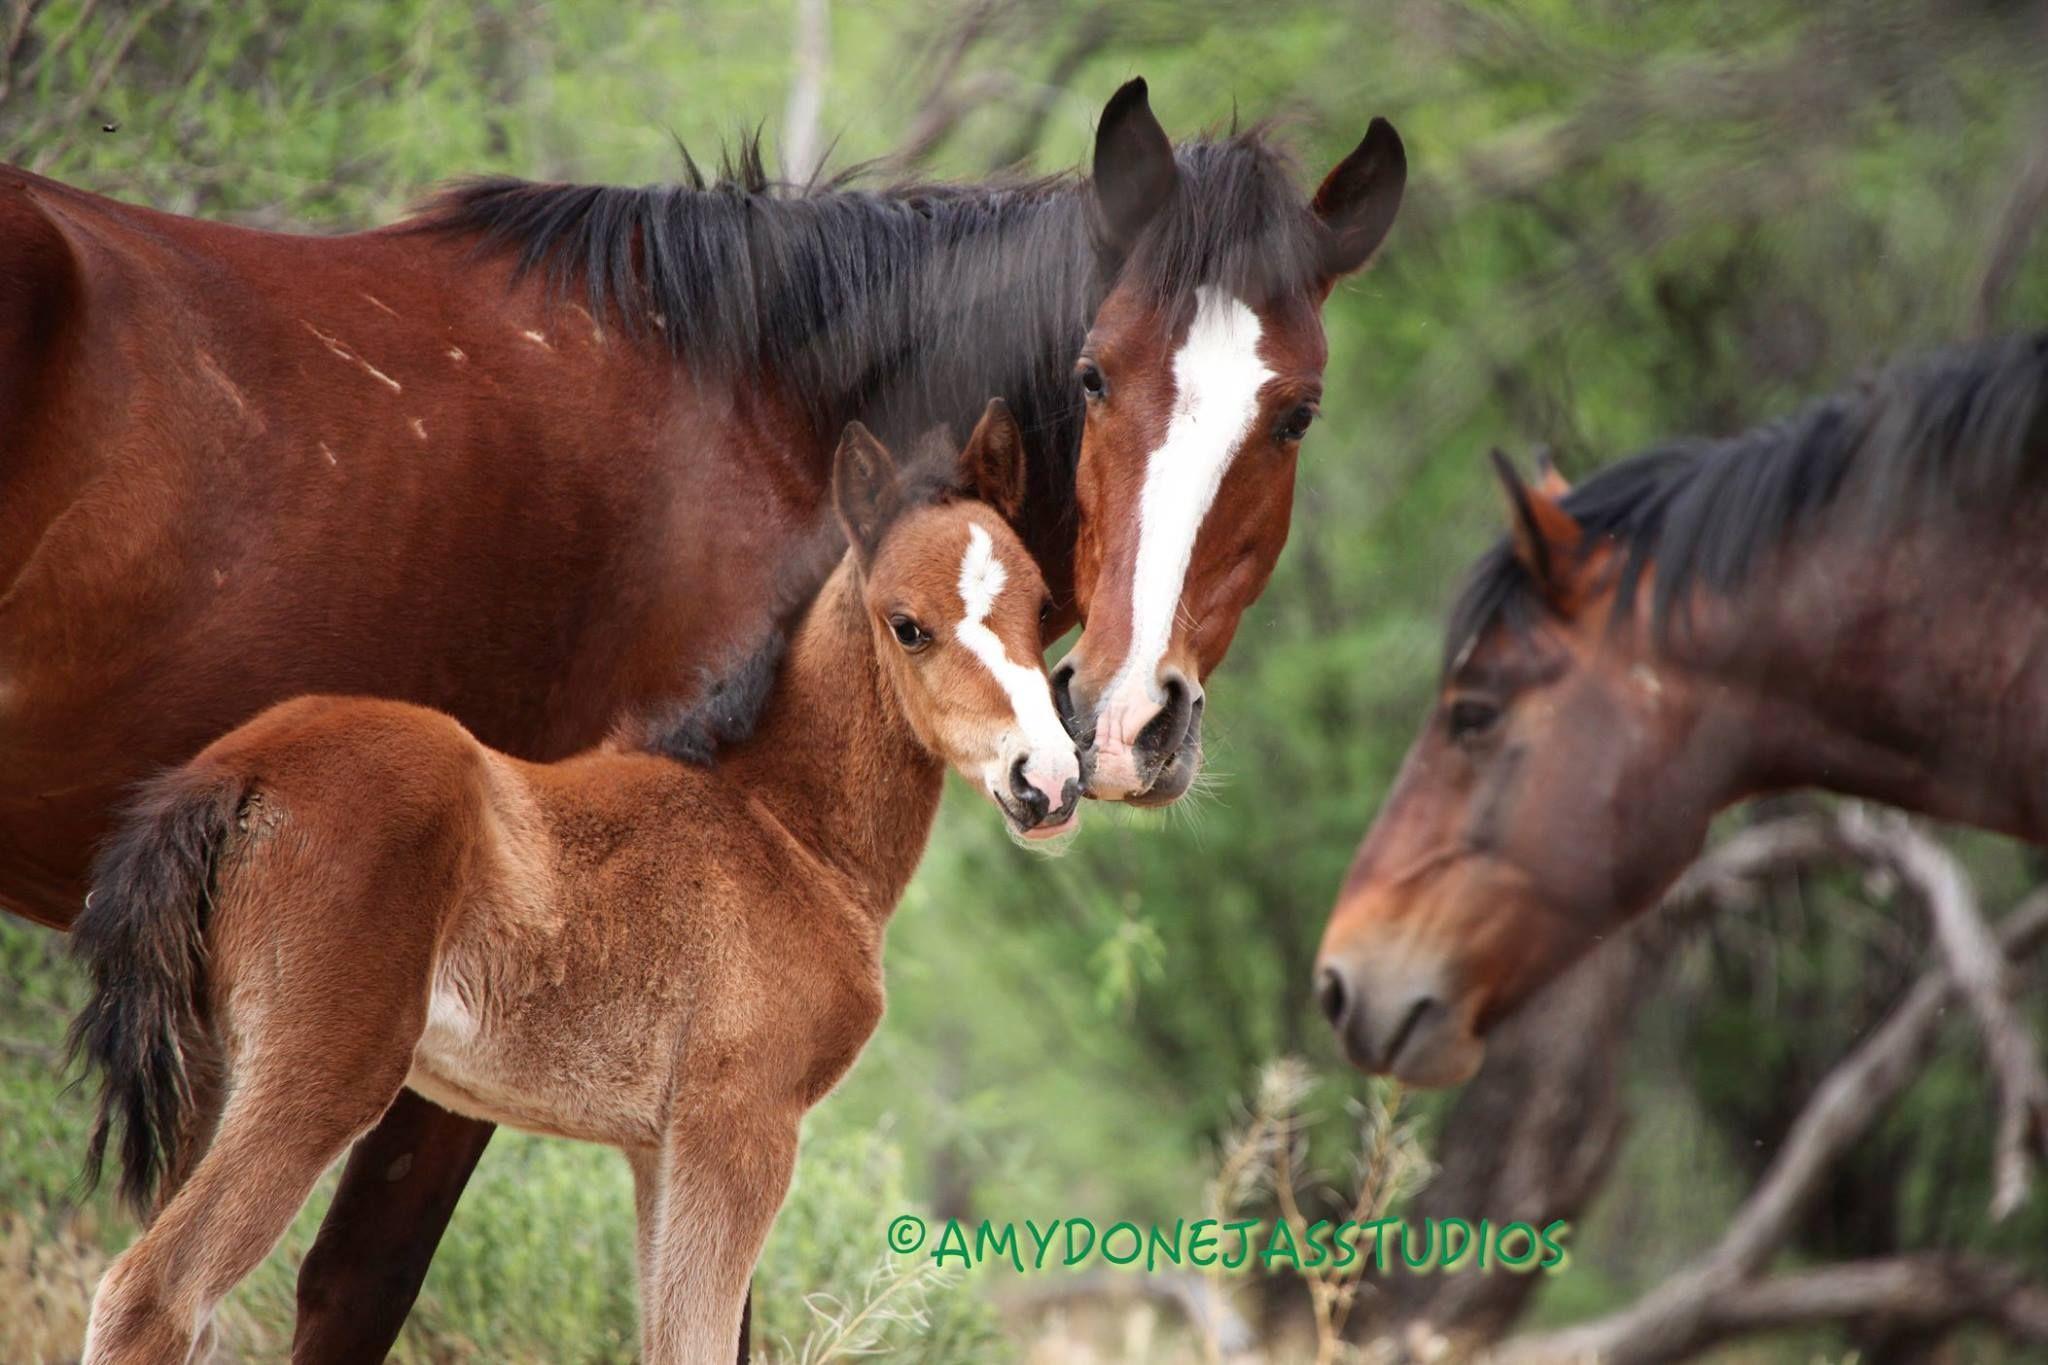 Wild horses - 'Family' © amydonejasstudios